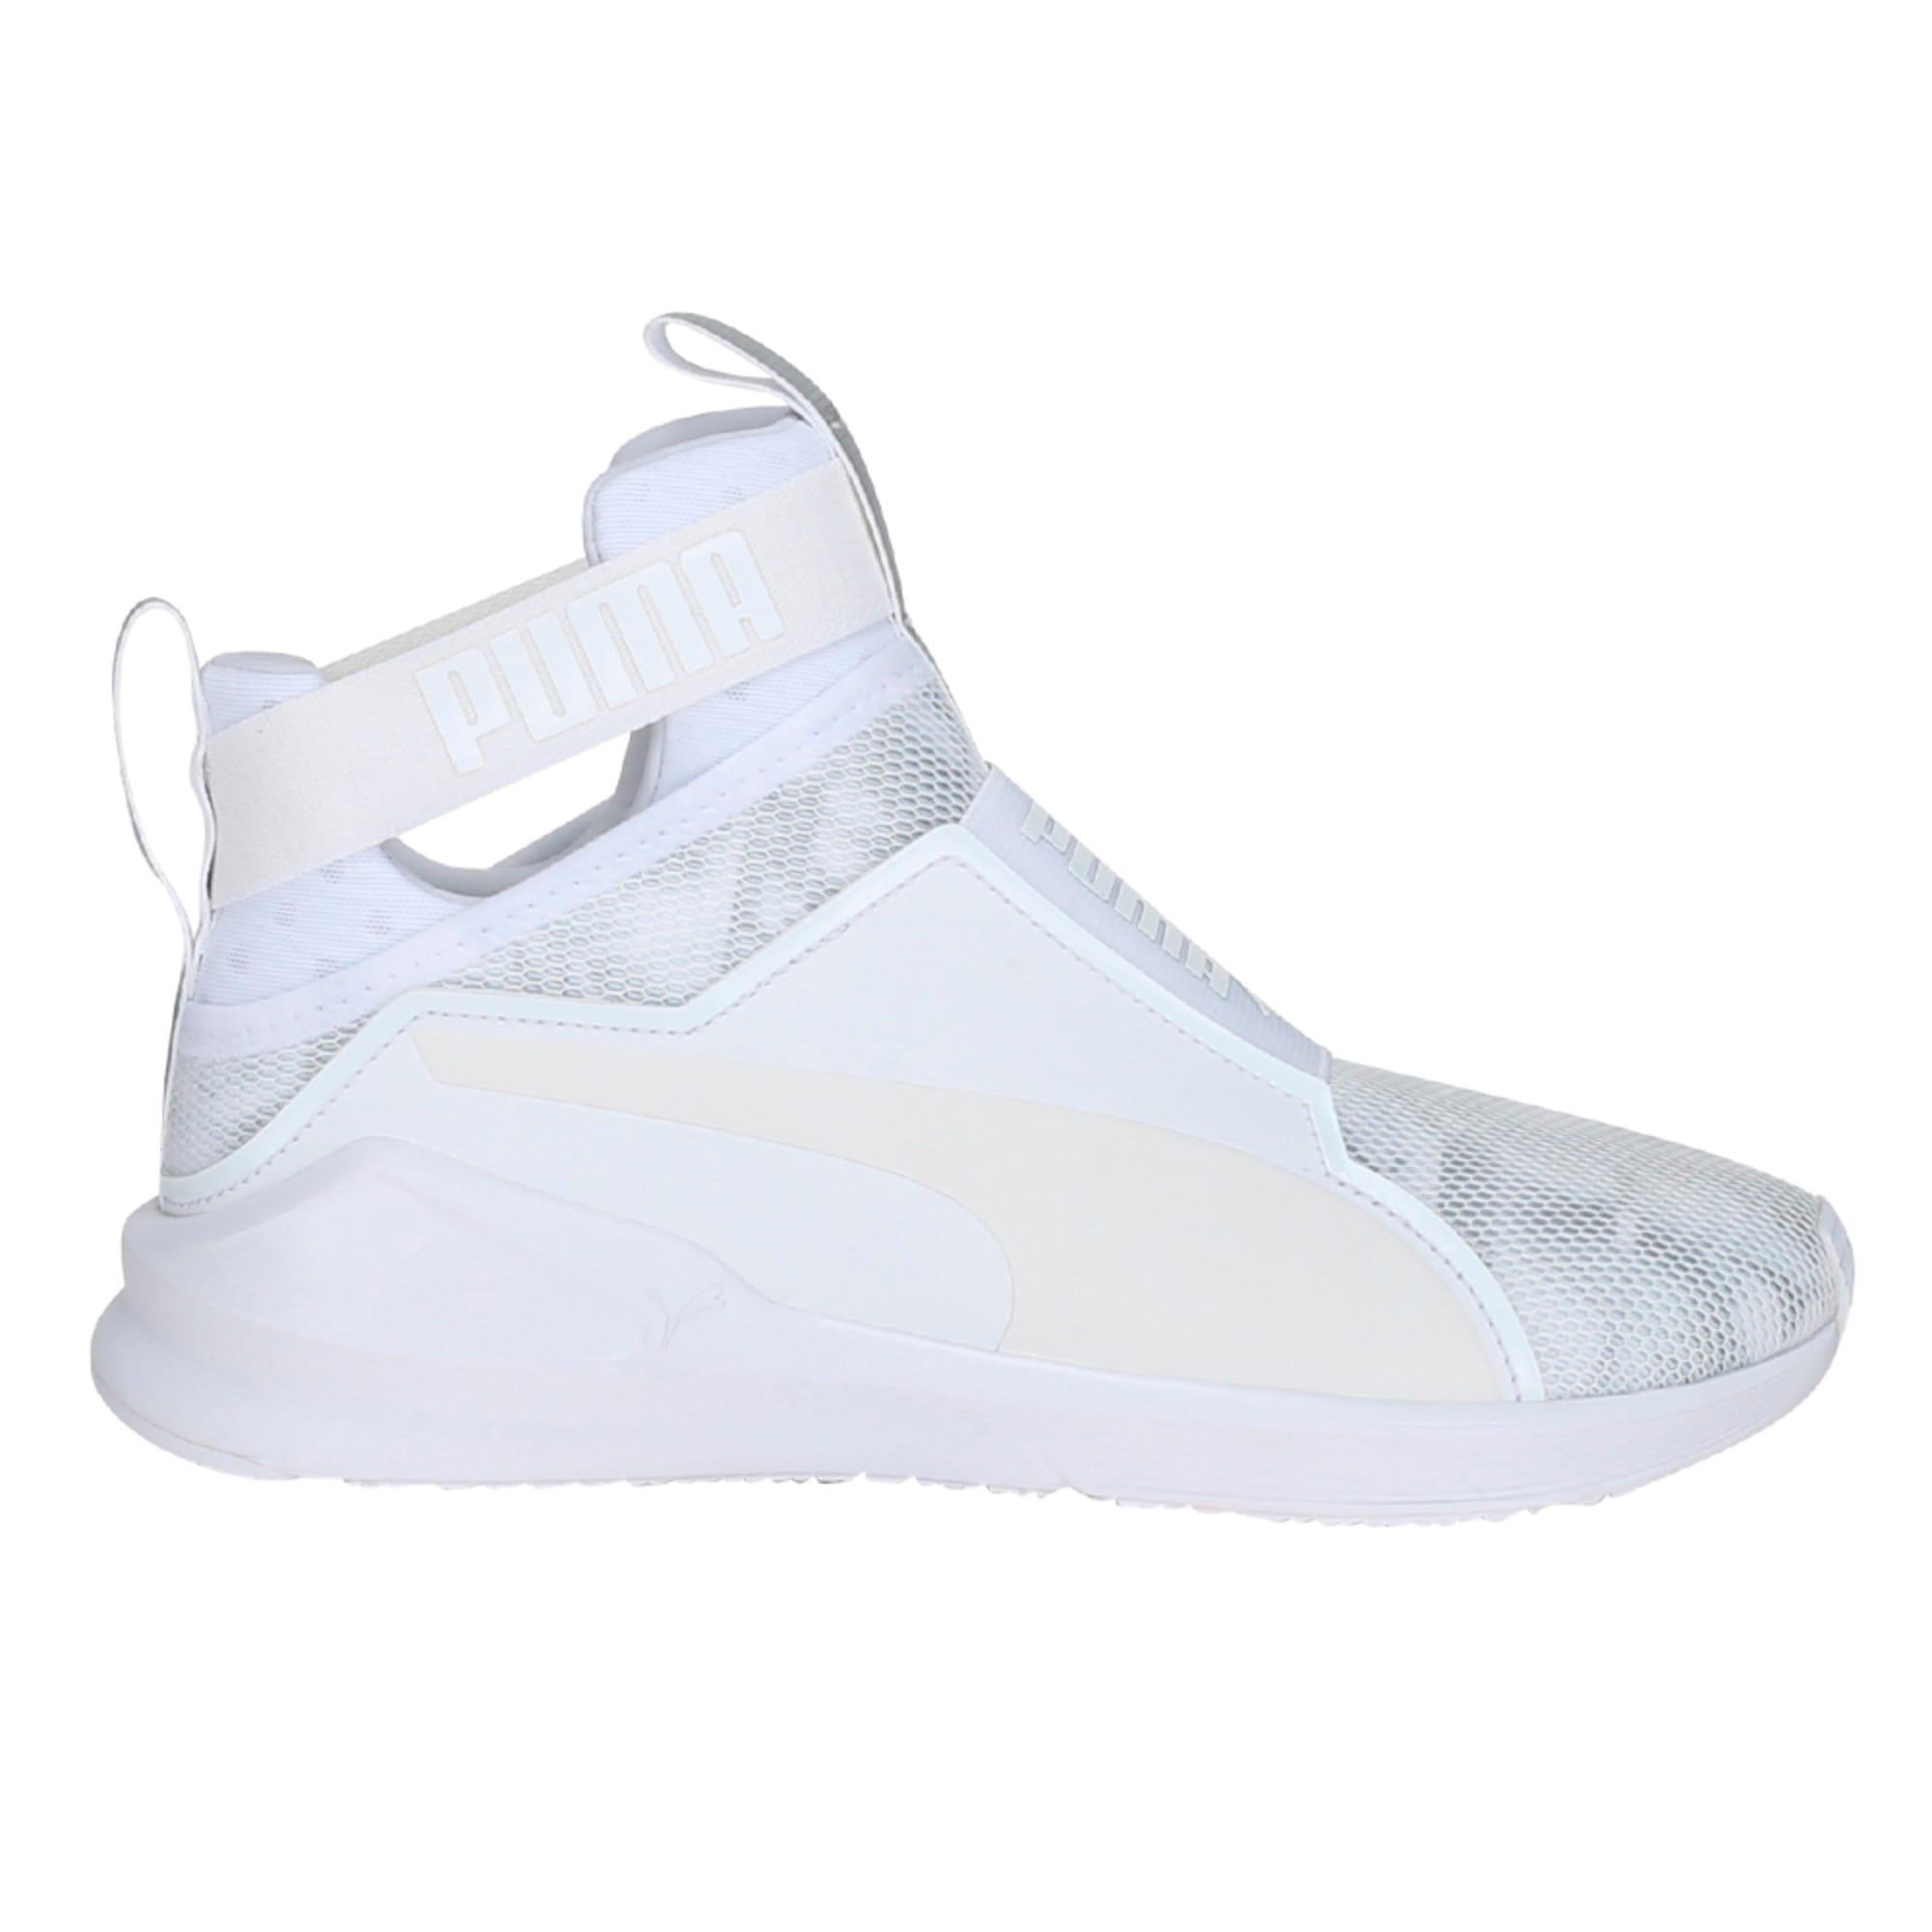 Thumbnail 1 of PUMA Fierce Swan Training Shoes, Puma White-Puma White, medium-IND